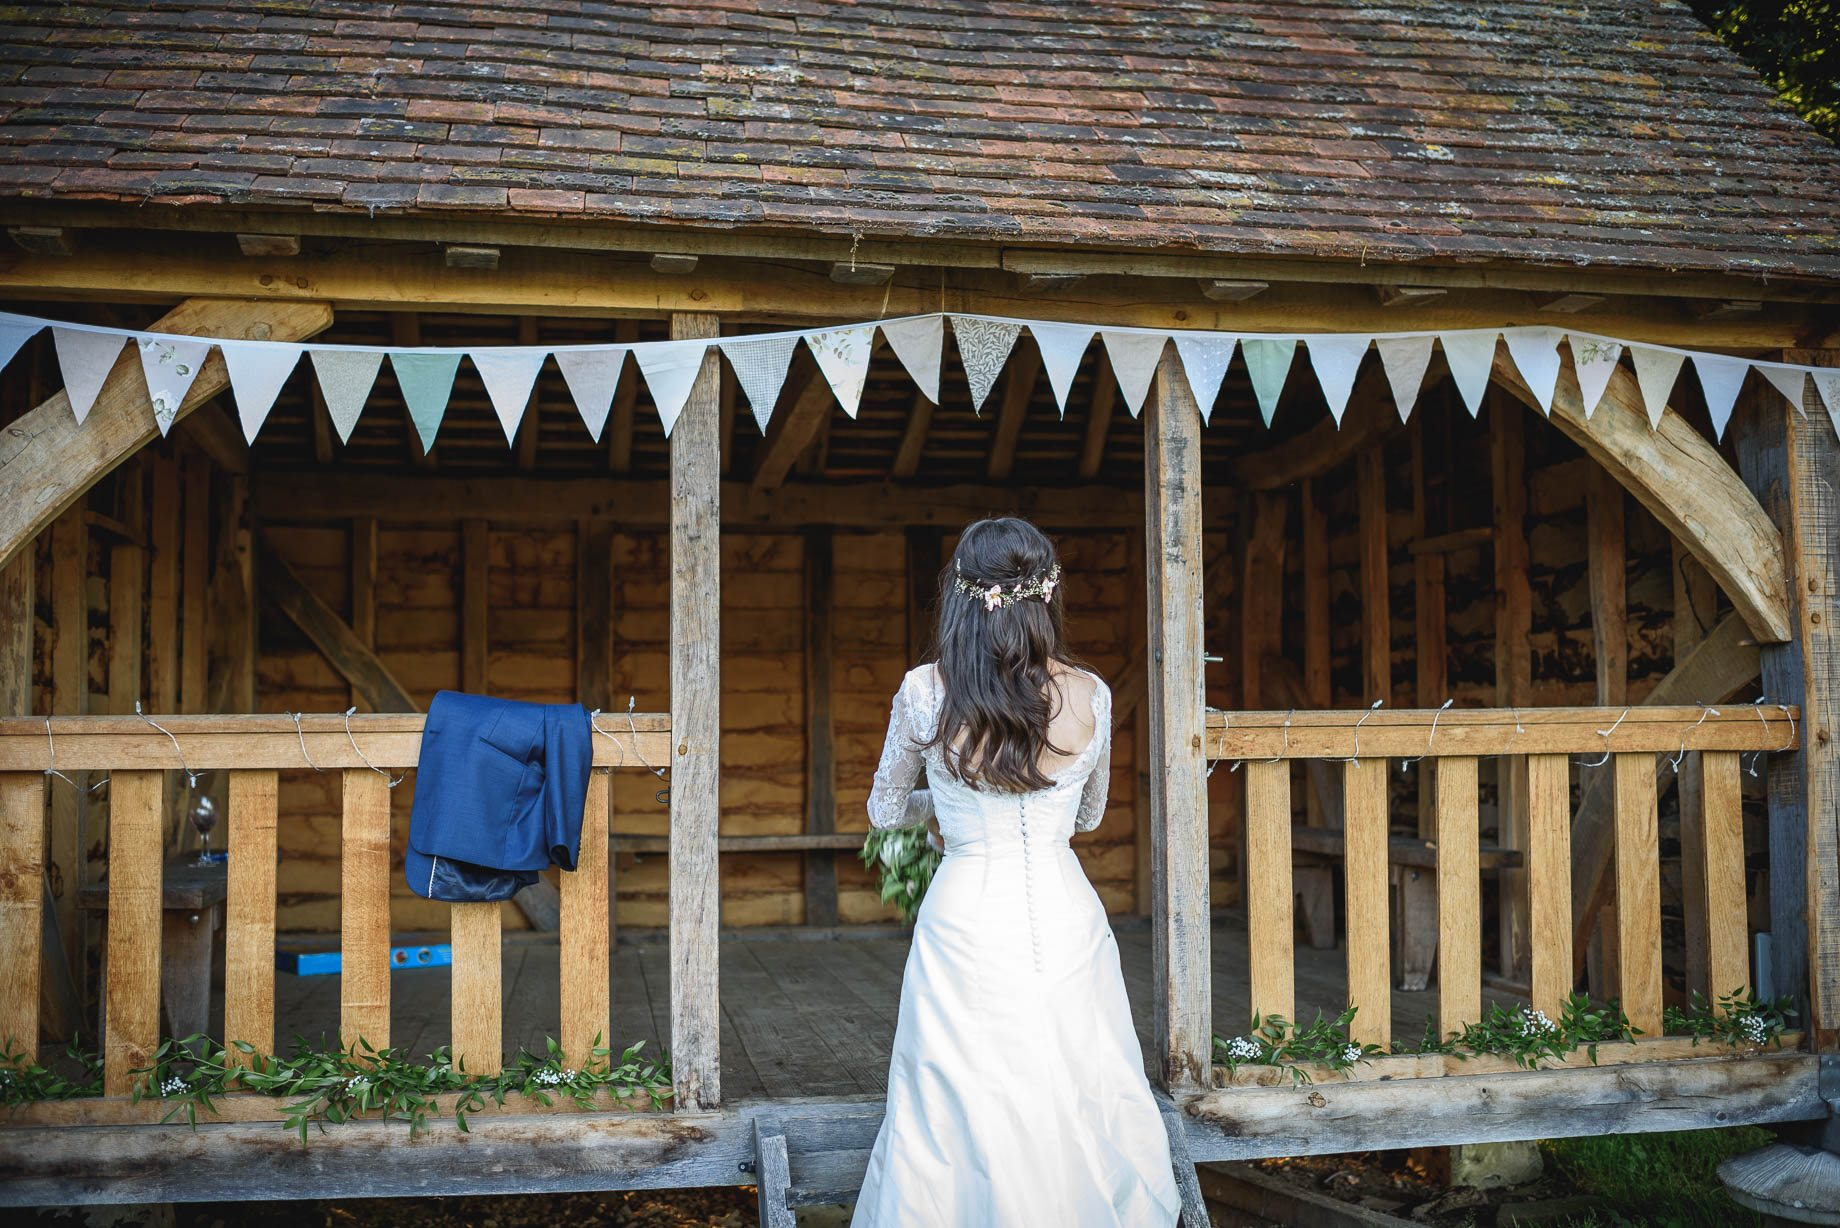 Gildings Barn wedding photography - Sarah and Steve (171 of 190)